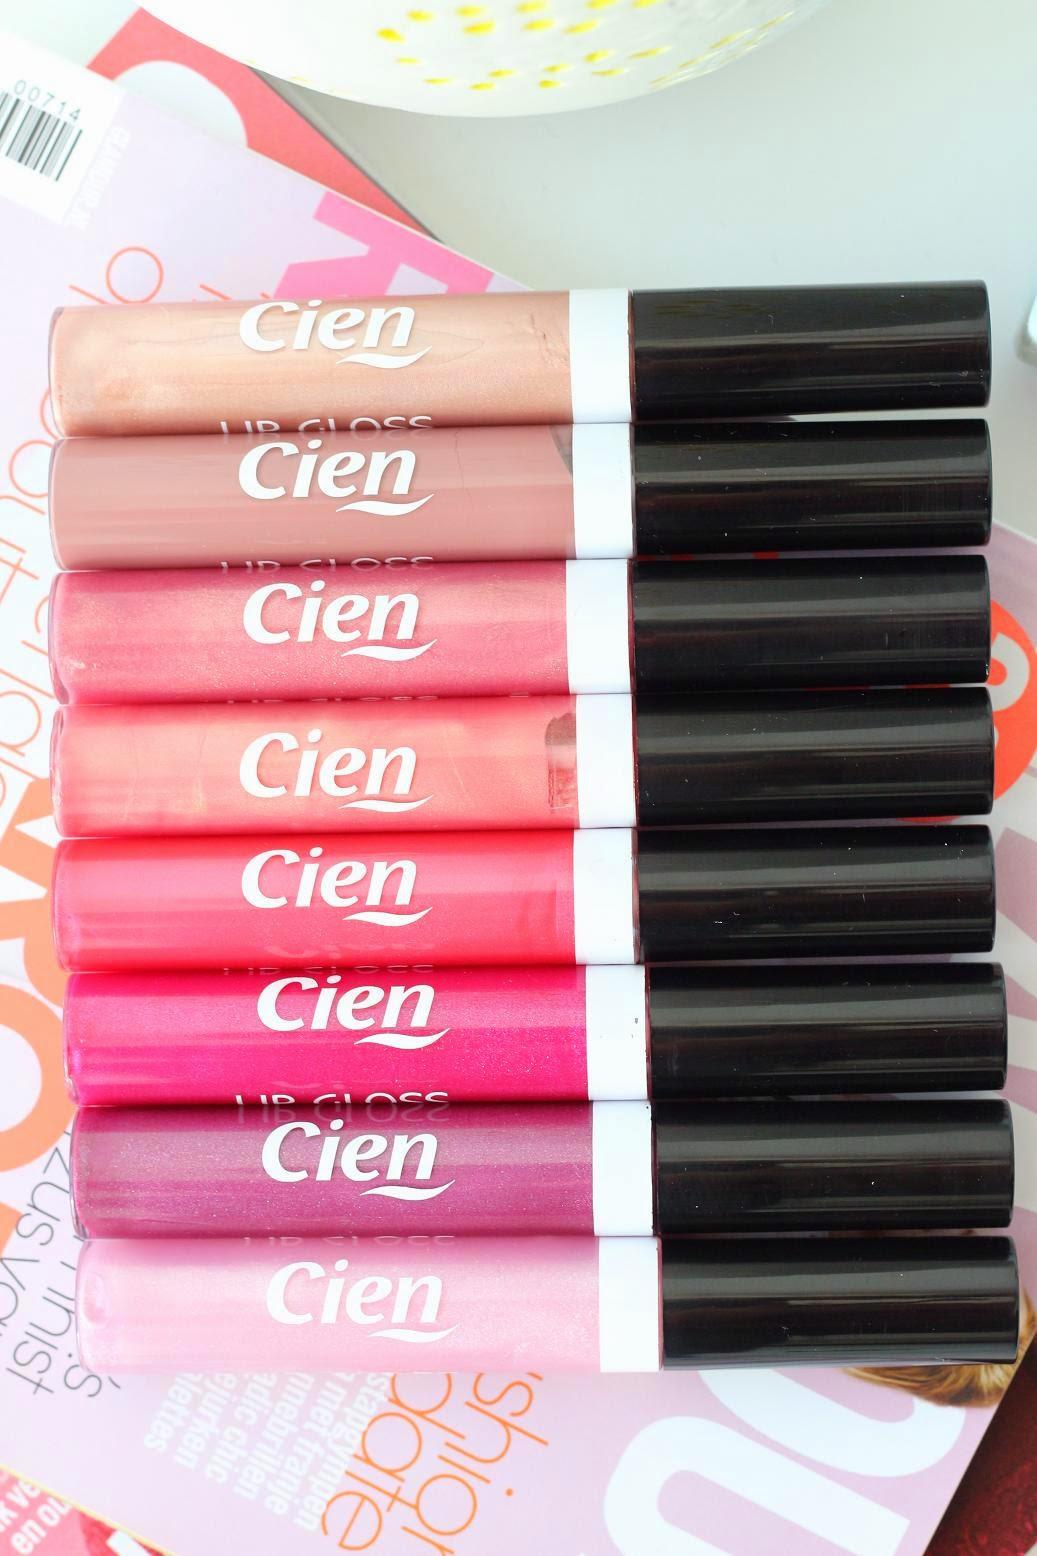 Cien lipgloss